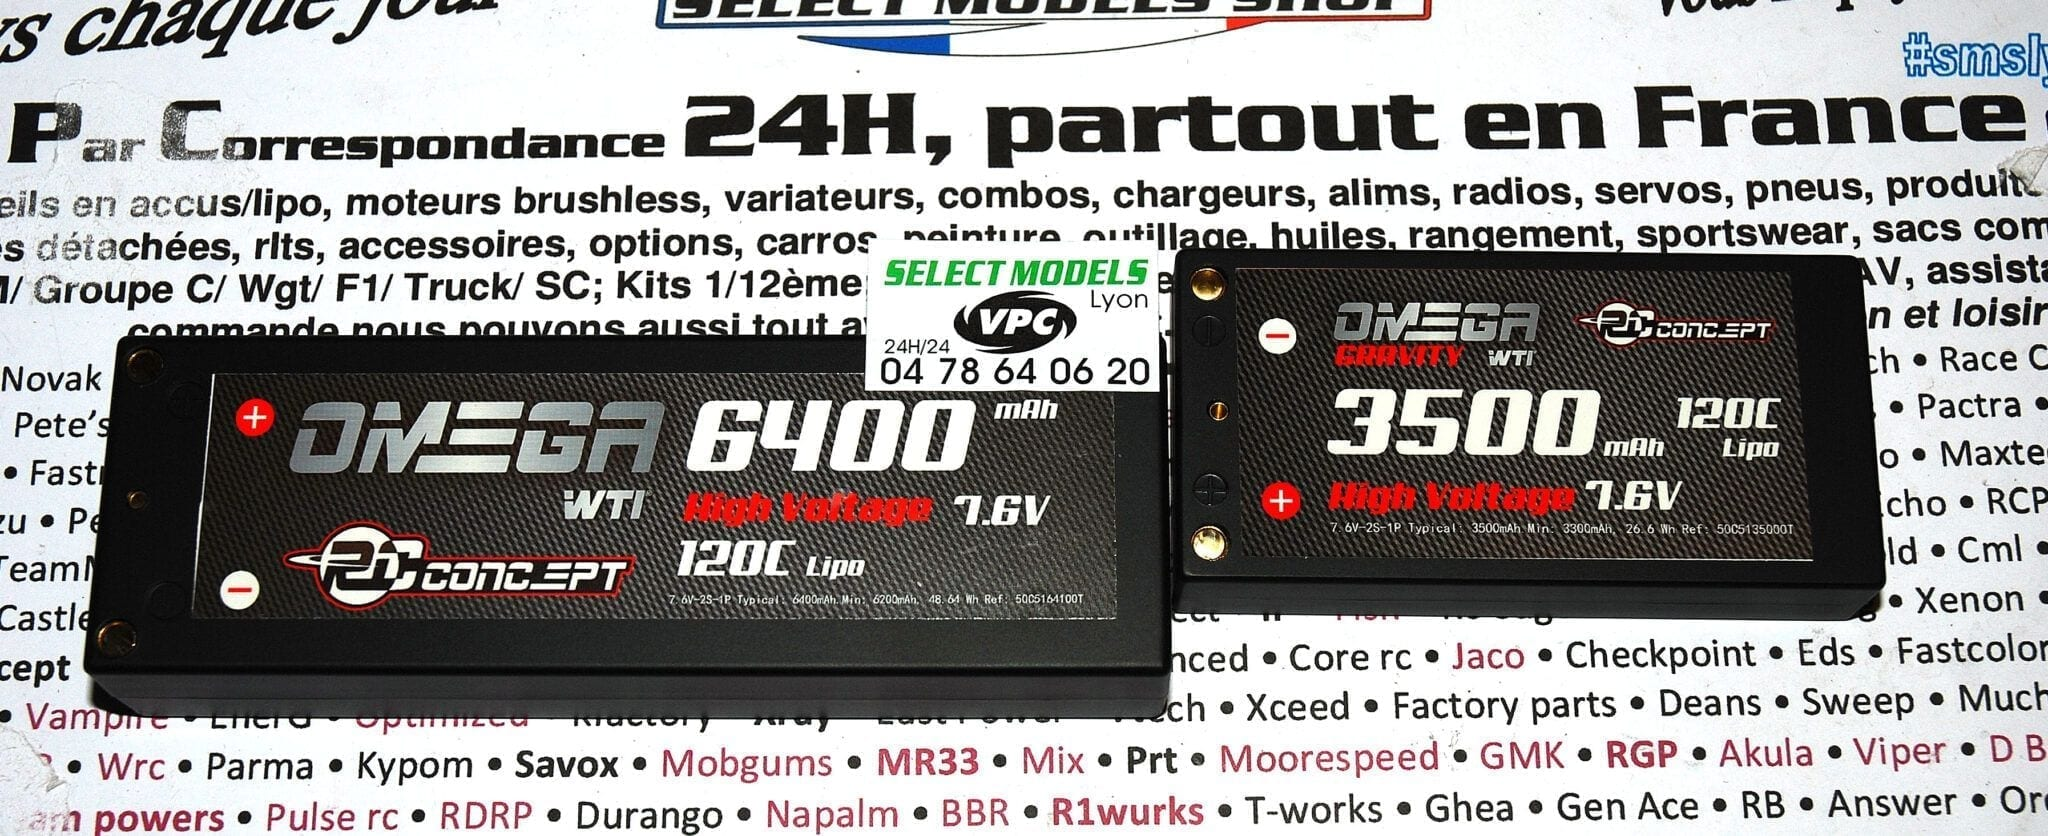 Lipo HV 7.6v 120c rc concept en 3500 shorty lcg et 6400mAh